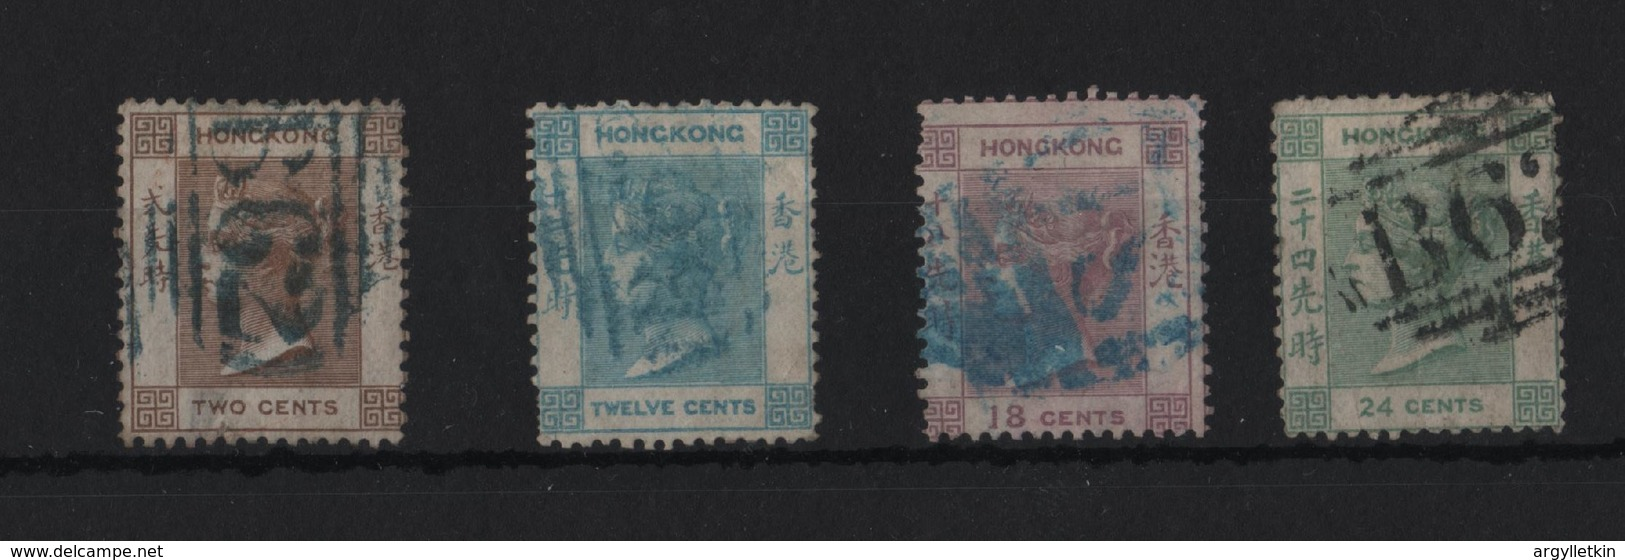 HONG KONG QUEEN VICTORIA DE LA RUE 1862-63 - Used Stamps